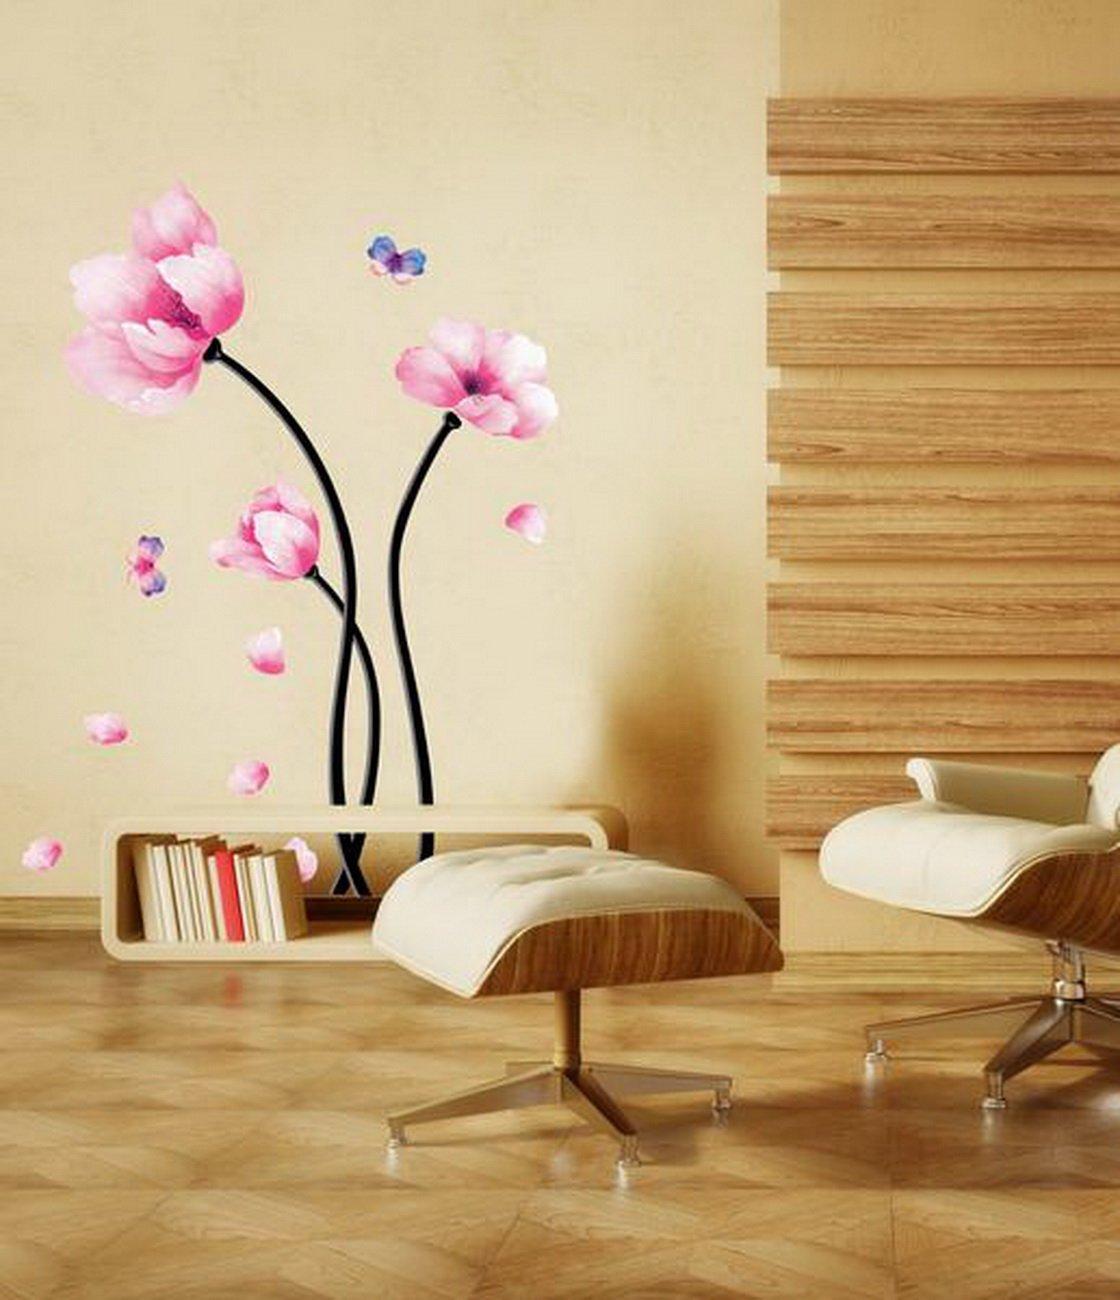 amazon com pink magnolia flowers wall stickers diy mural art amazon com pink magnolia flowers wall stickers diy mural art decal self adhesive removable pvc wallpaper decor 19 7 inch 27 6 inch original home kitchen